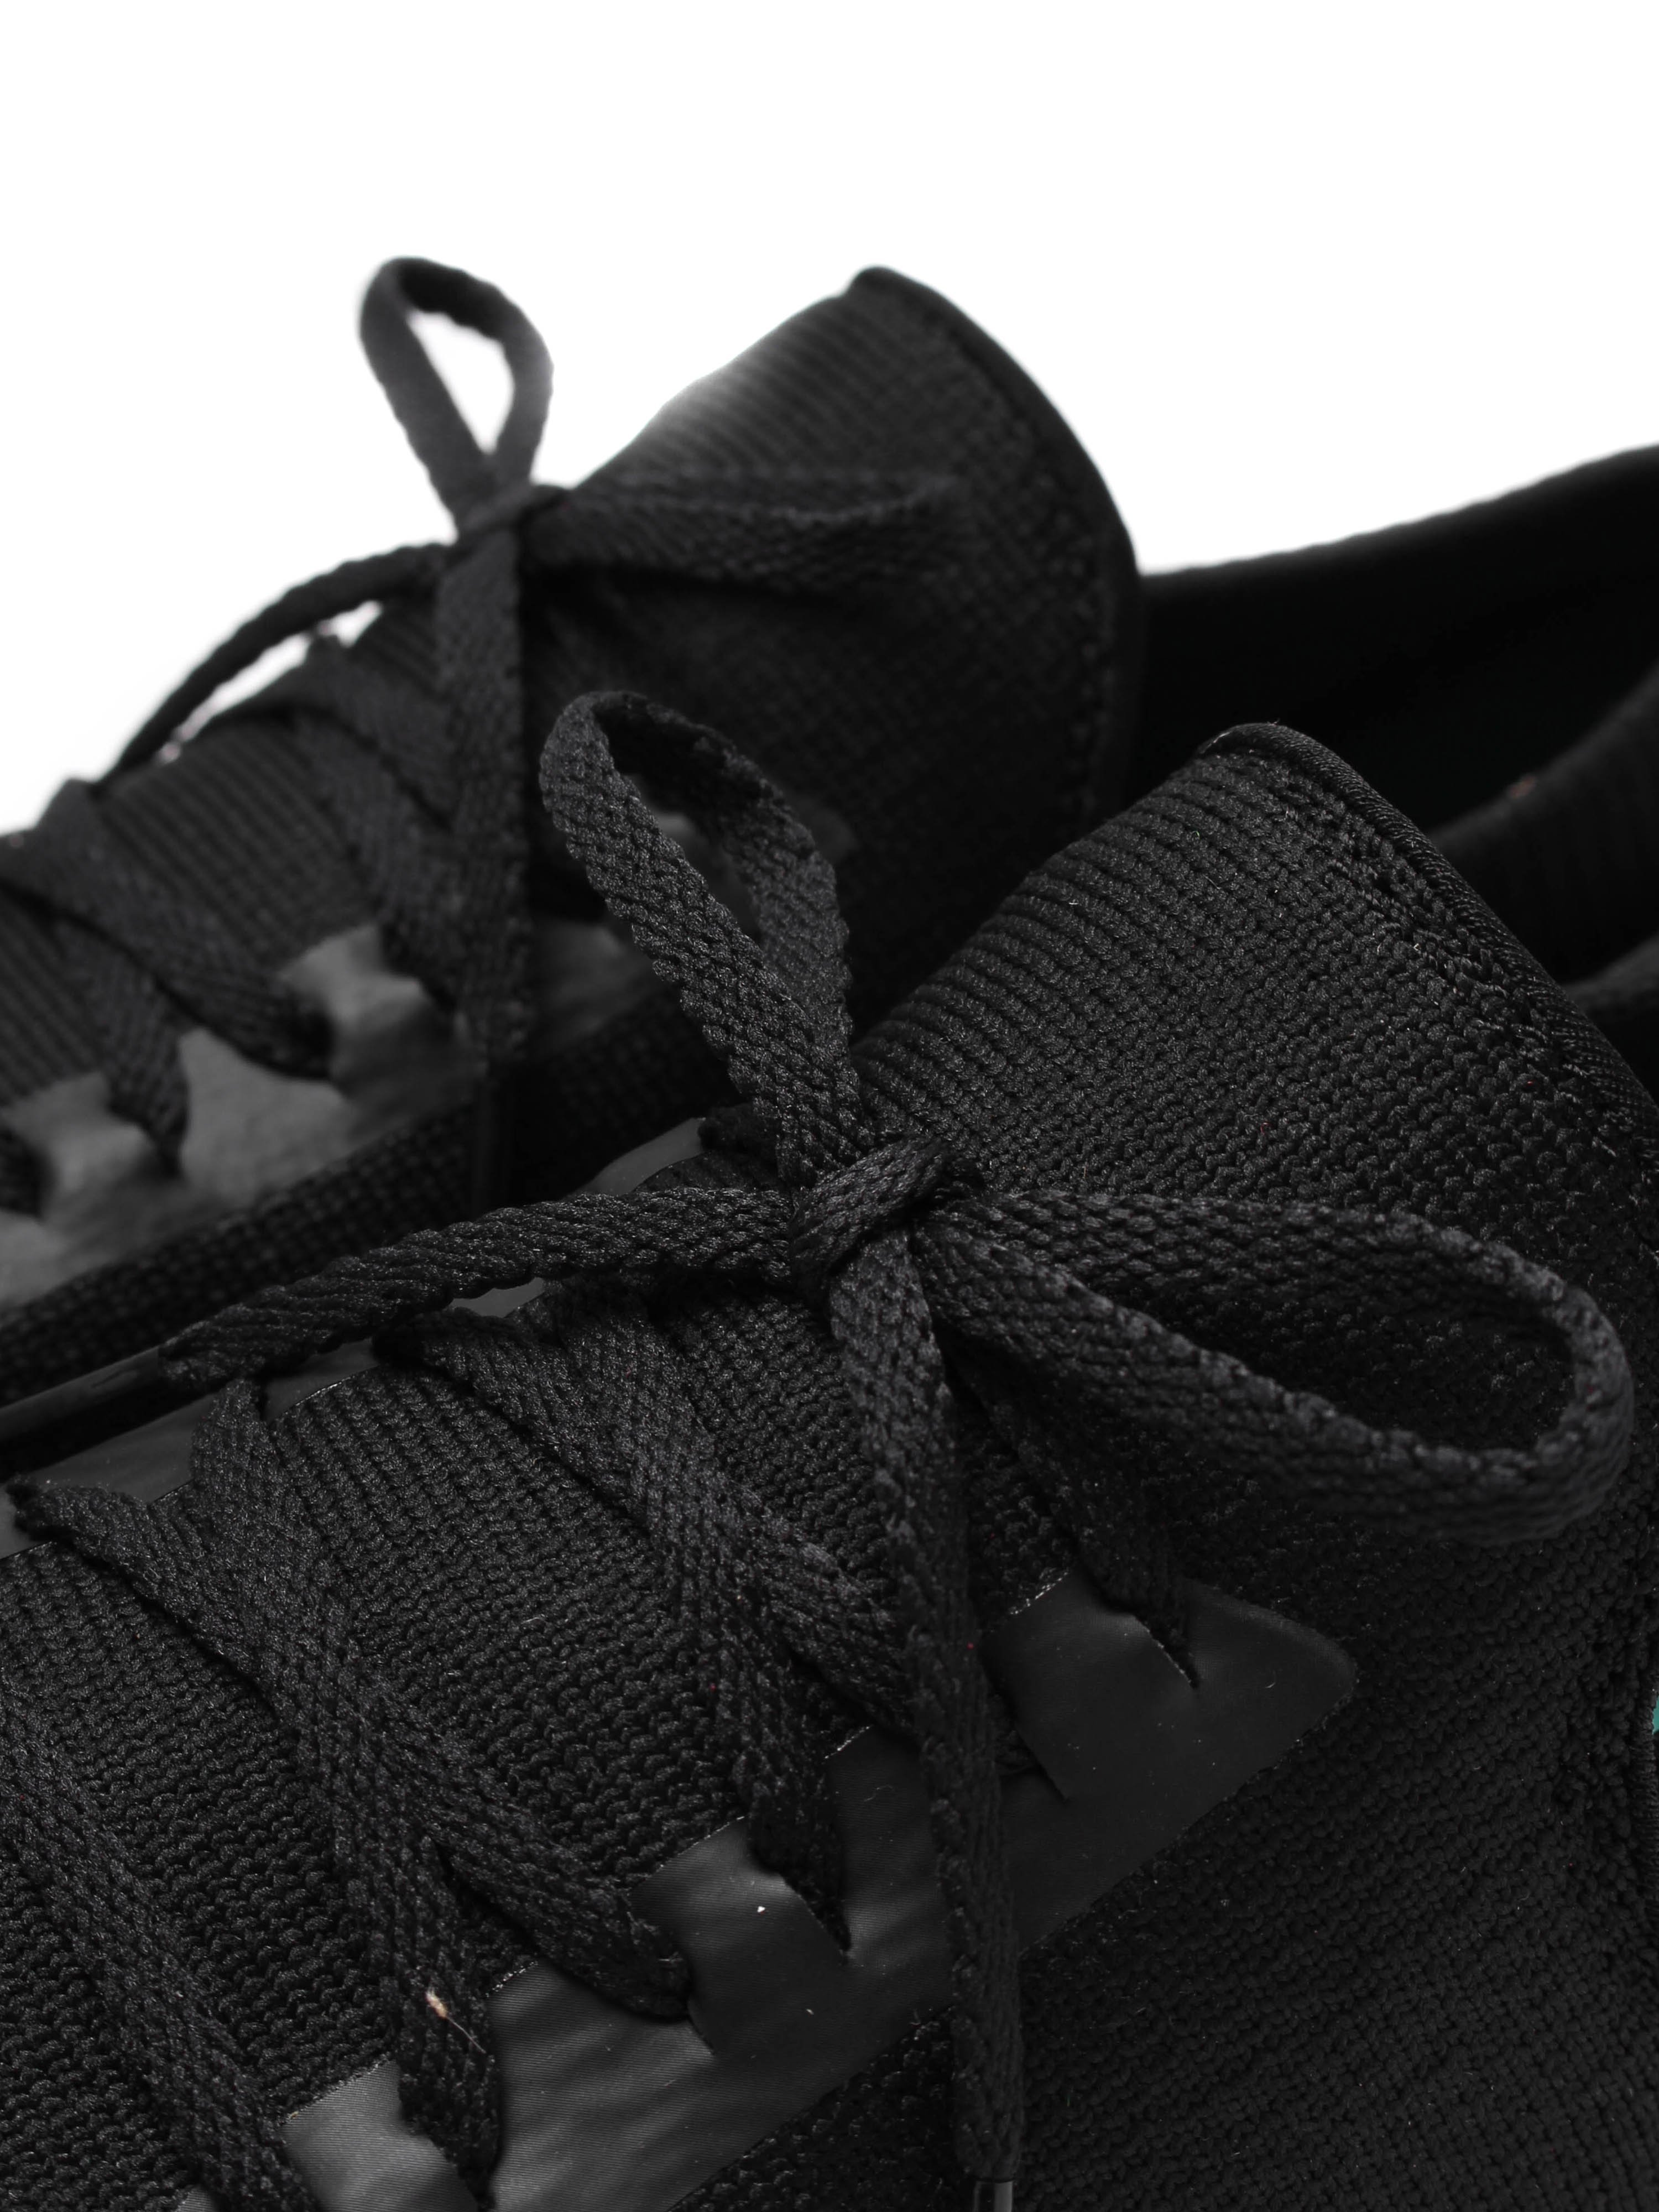 Skechers Women's You Inspire Trainers - Black